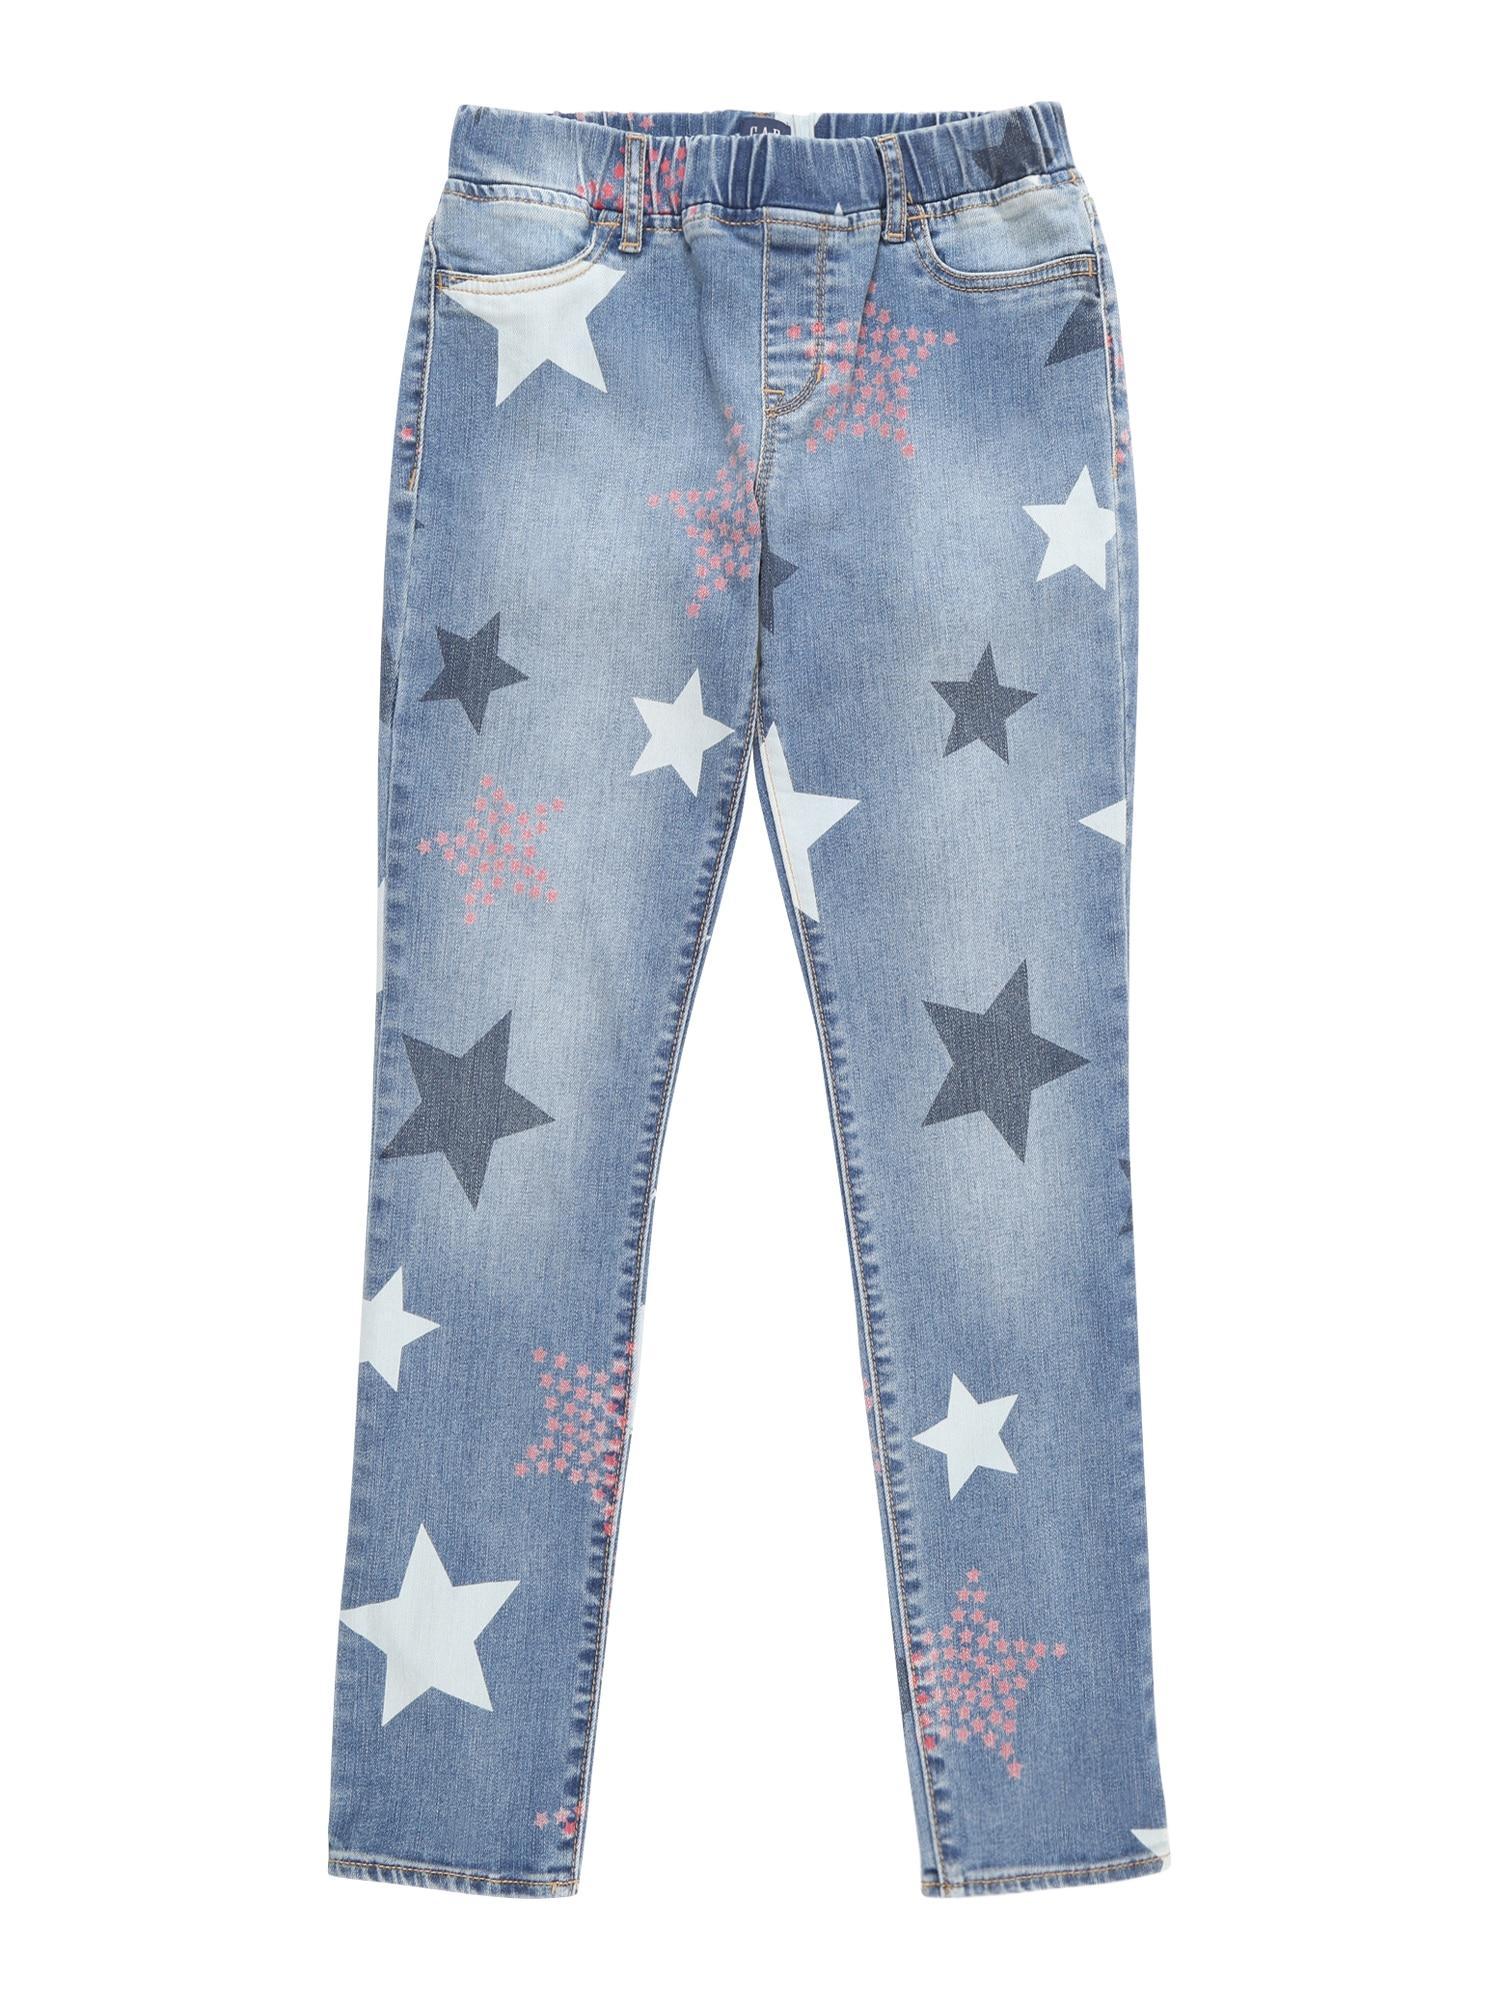 Džíny STAR PRNT JEG modrá GAP